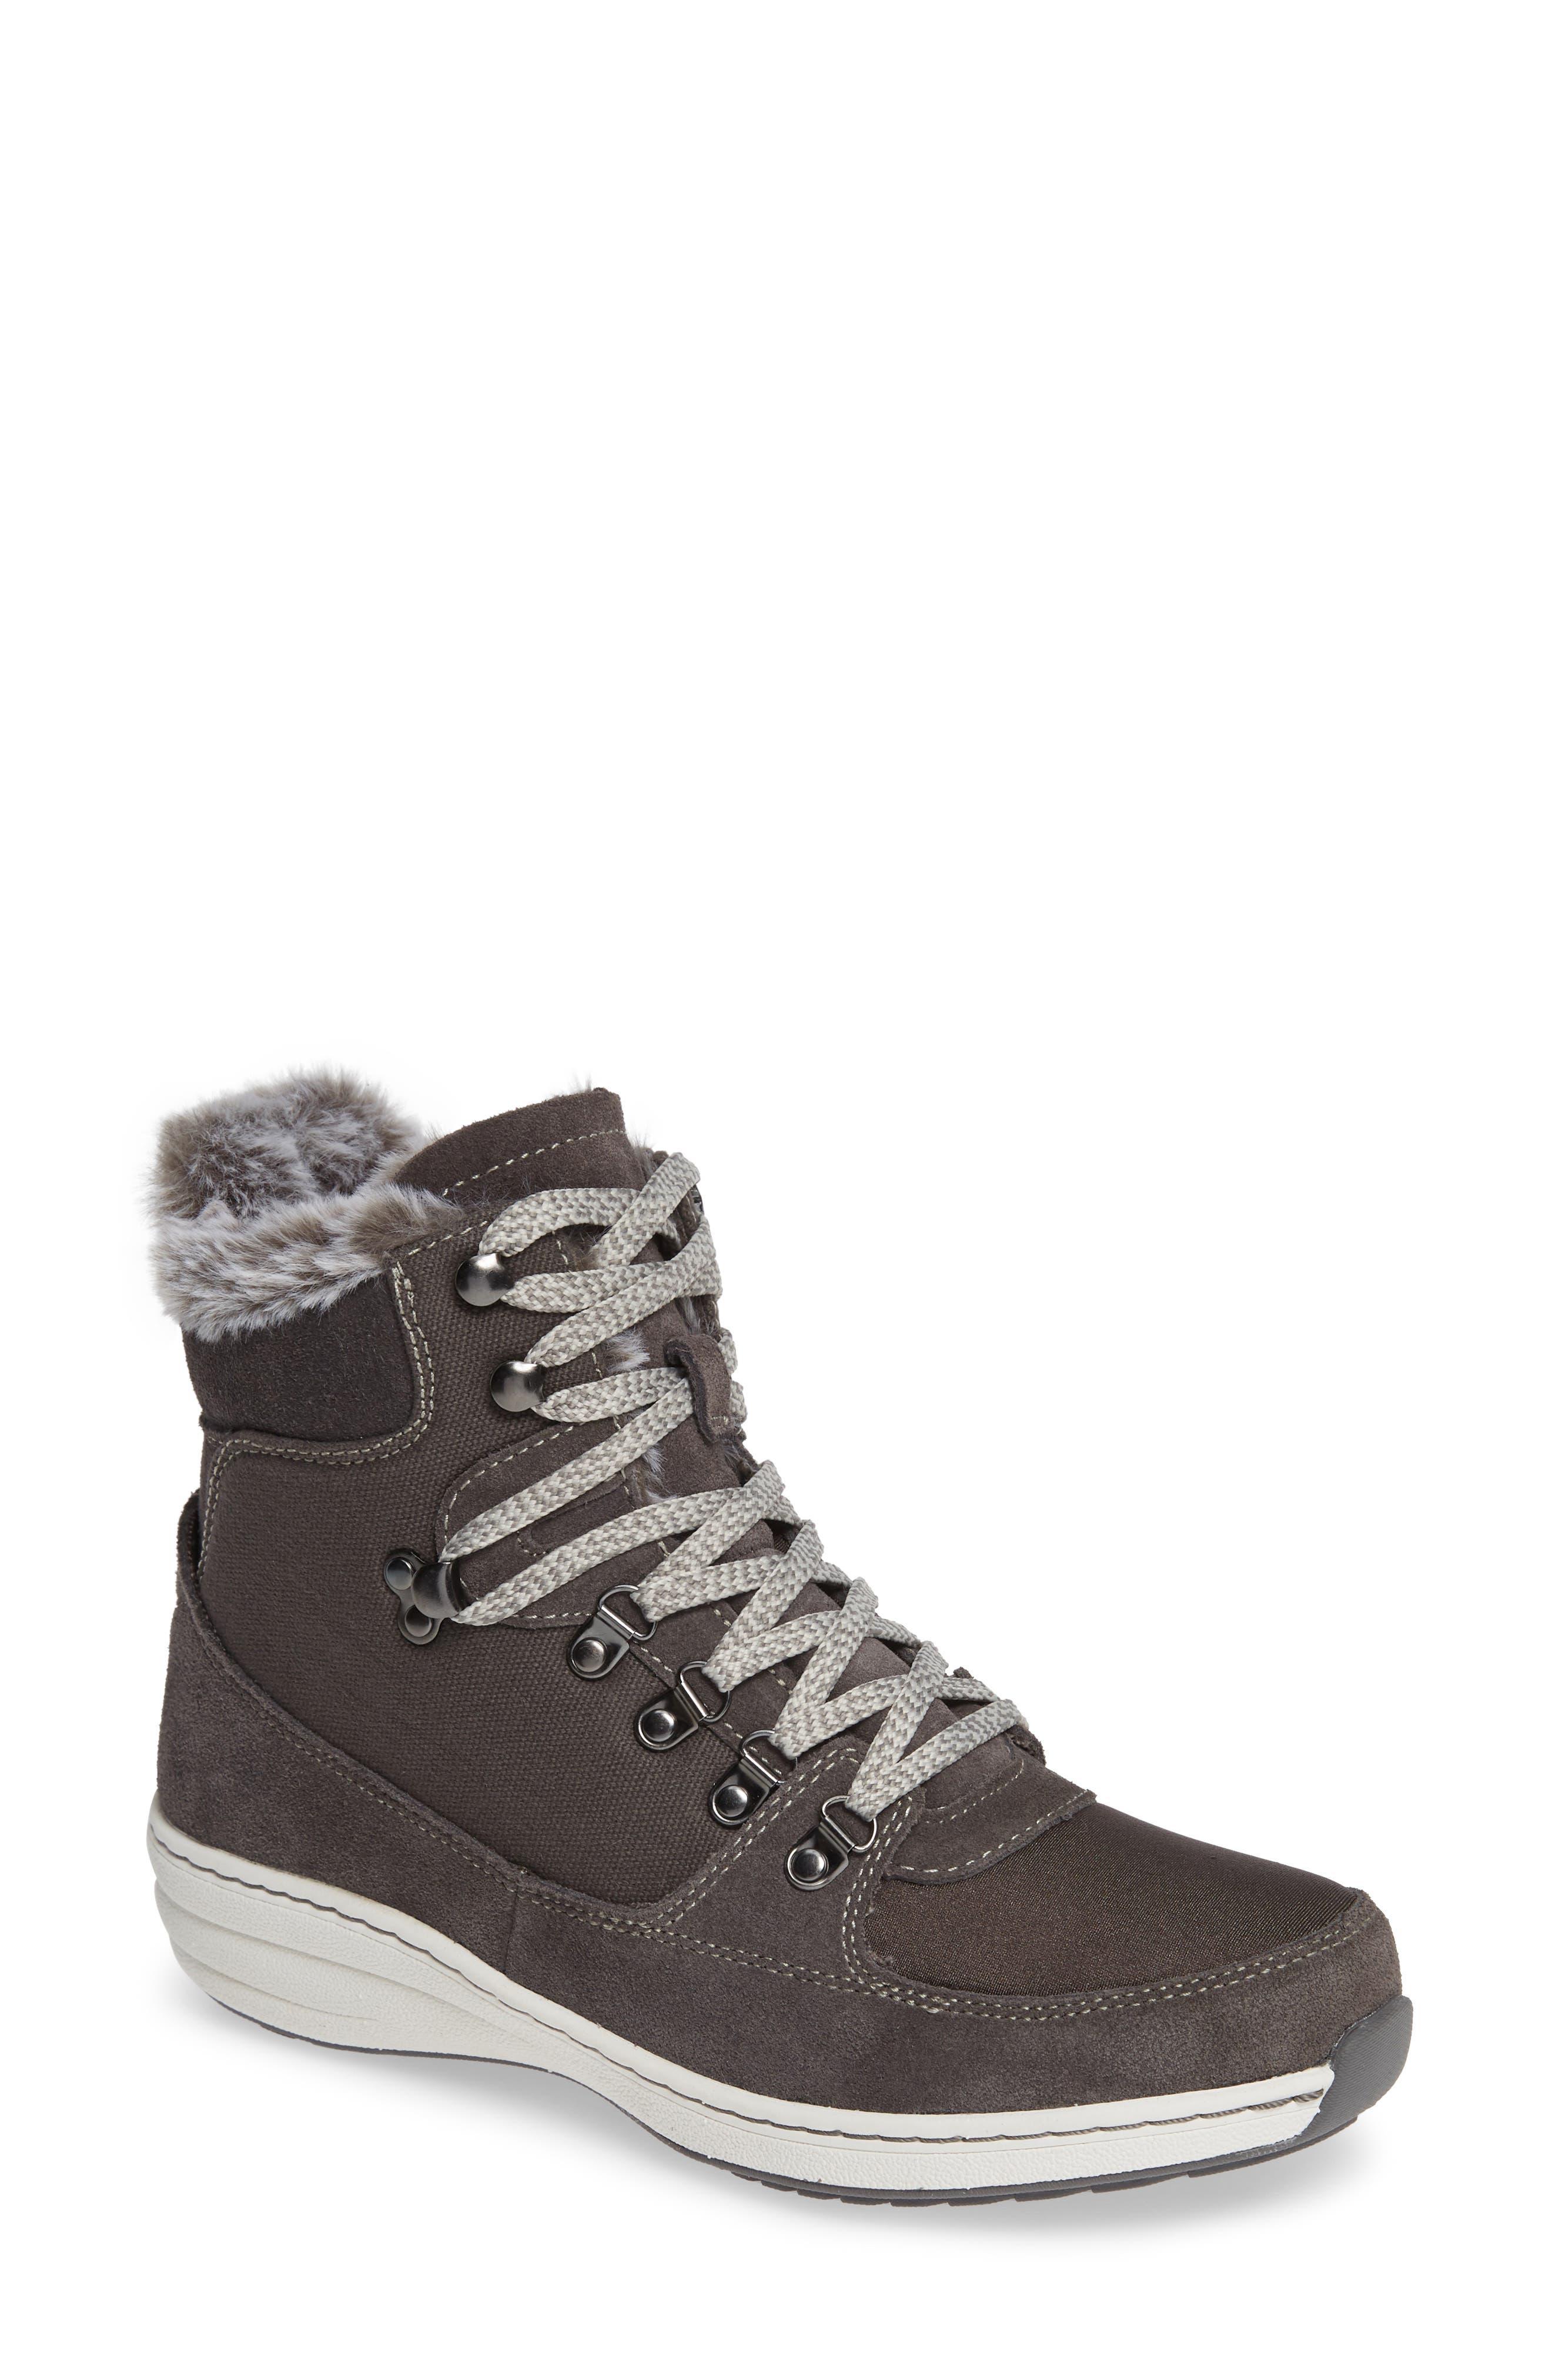 Aetrex Kelsey Faux Fur Lined Hiker Boot - Grey